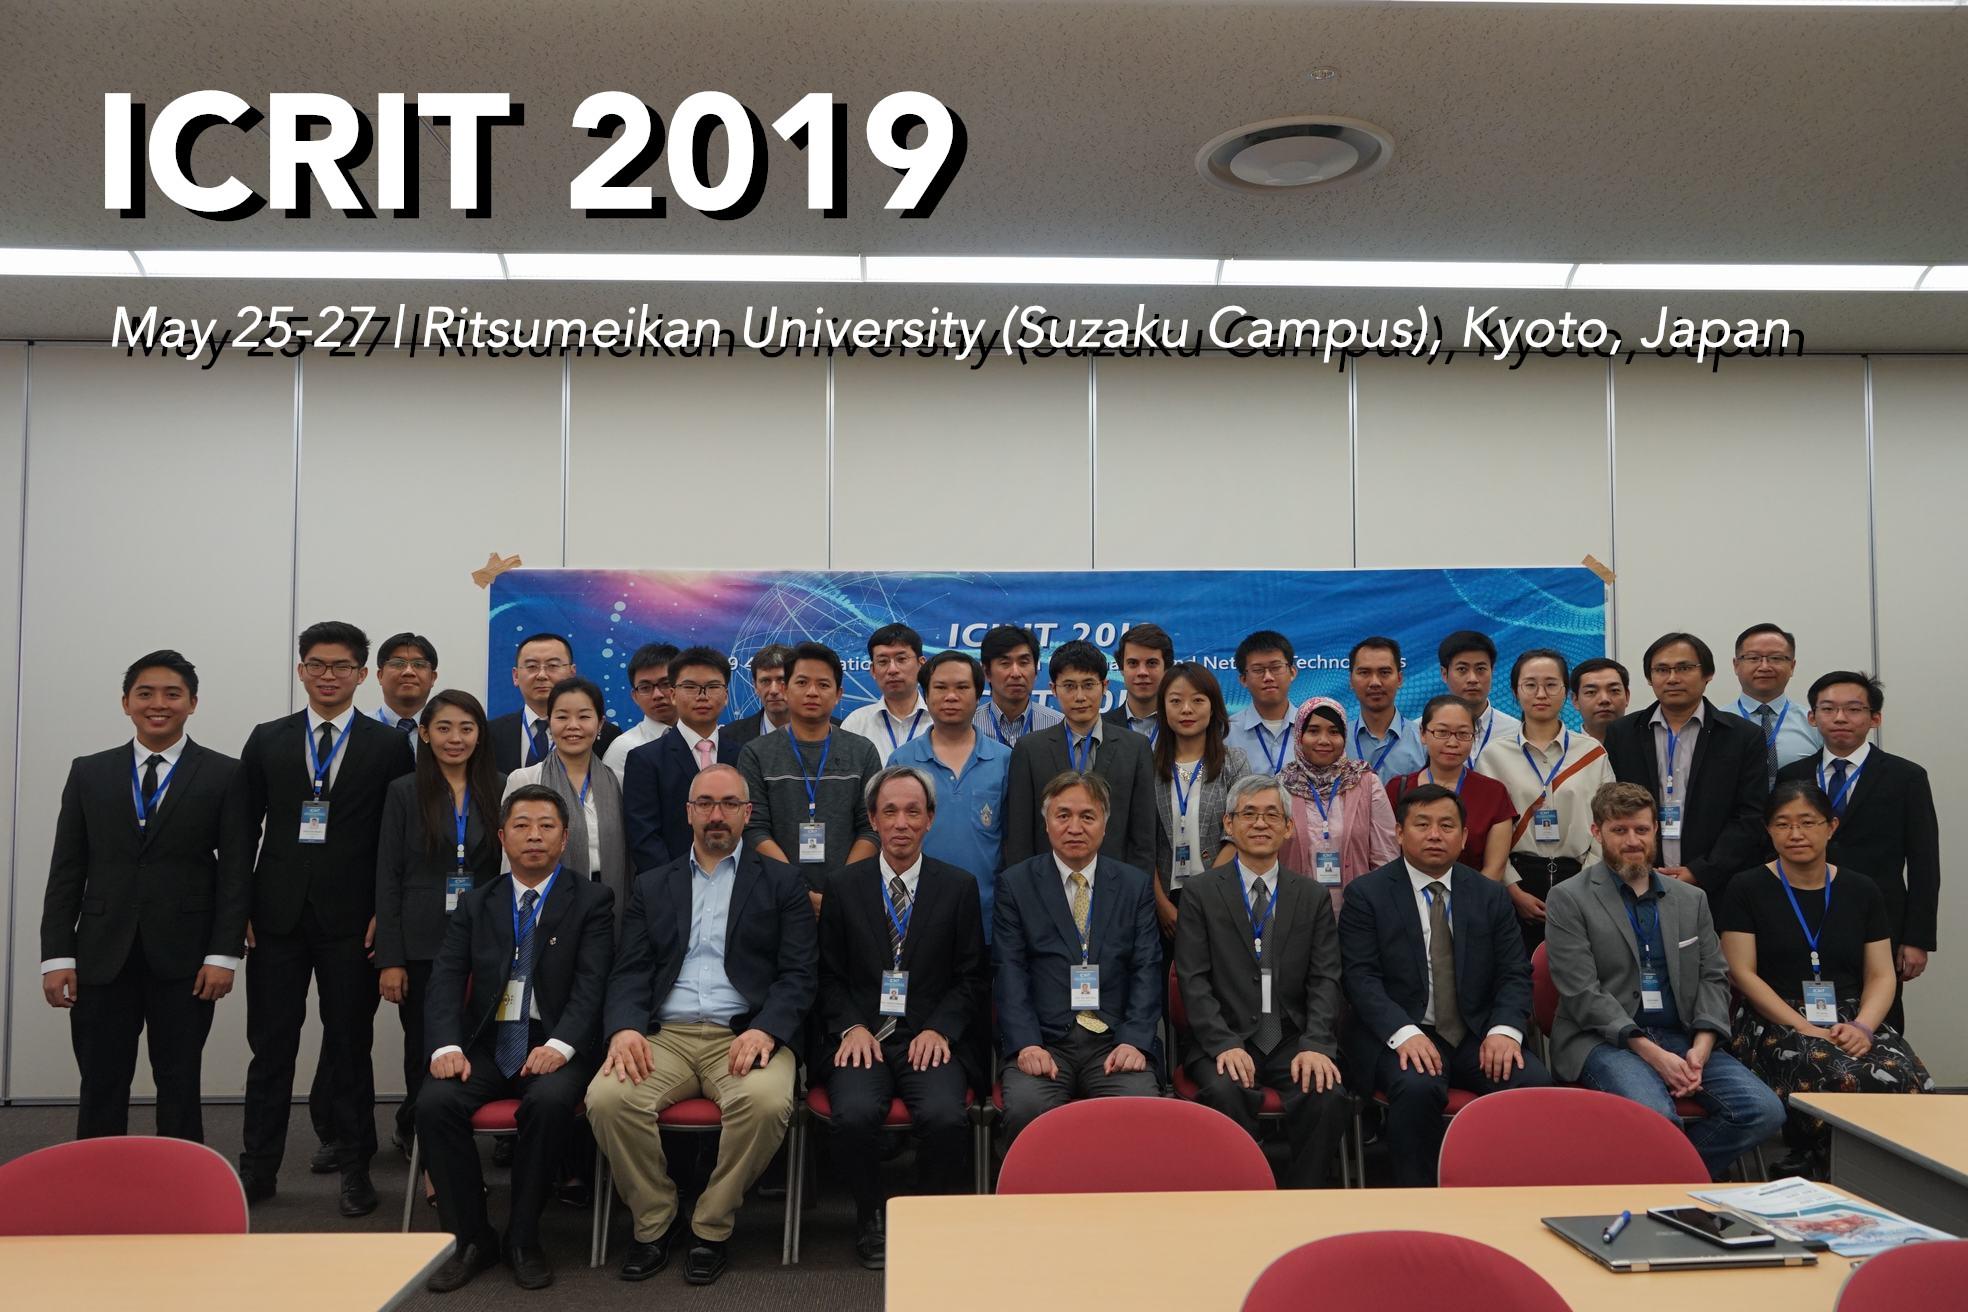 ICRIT 2020